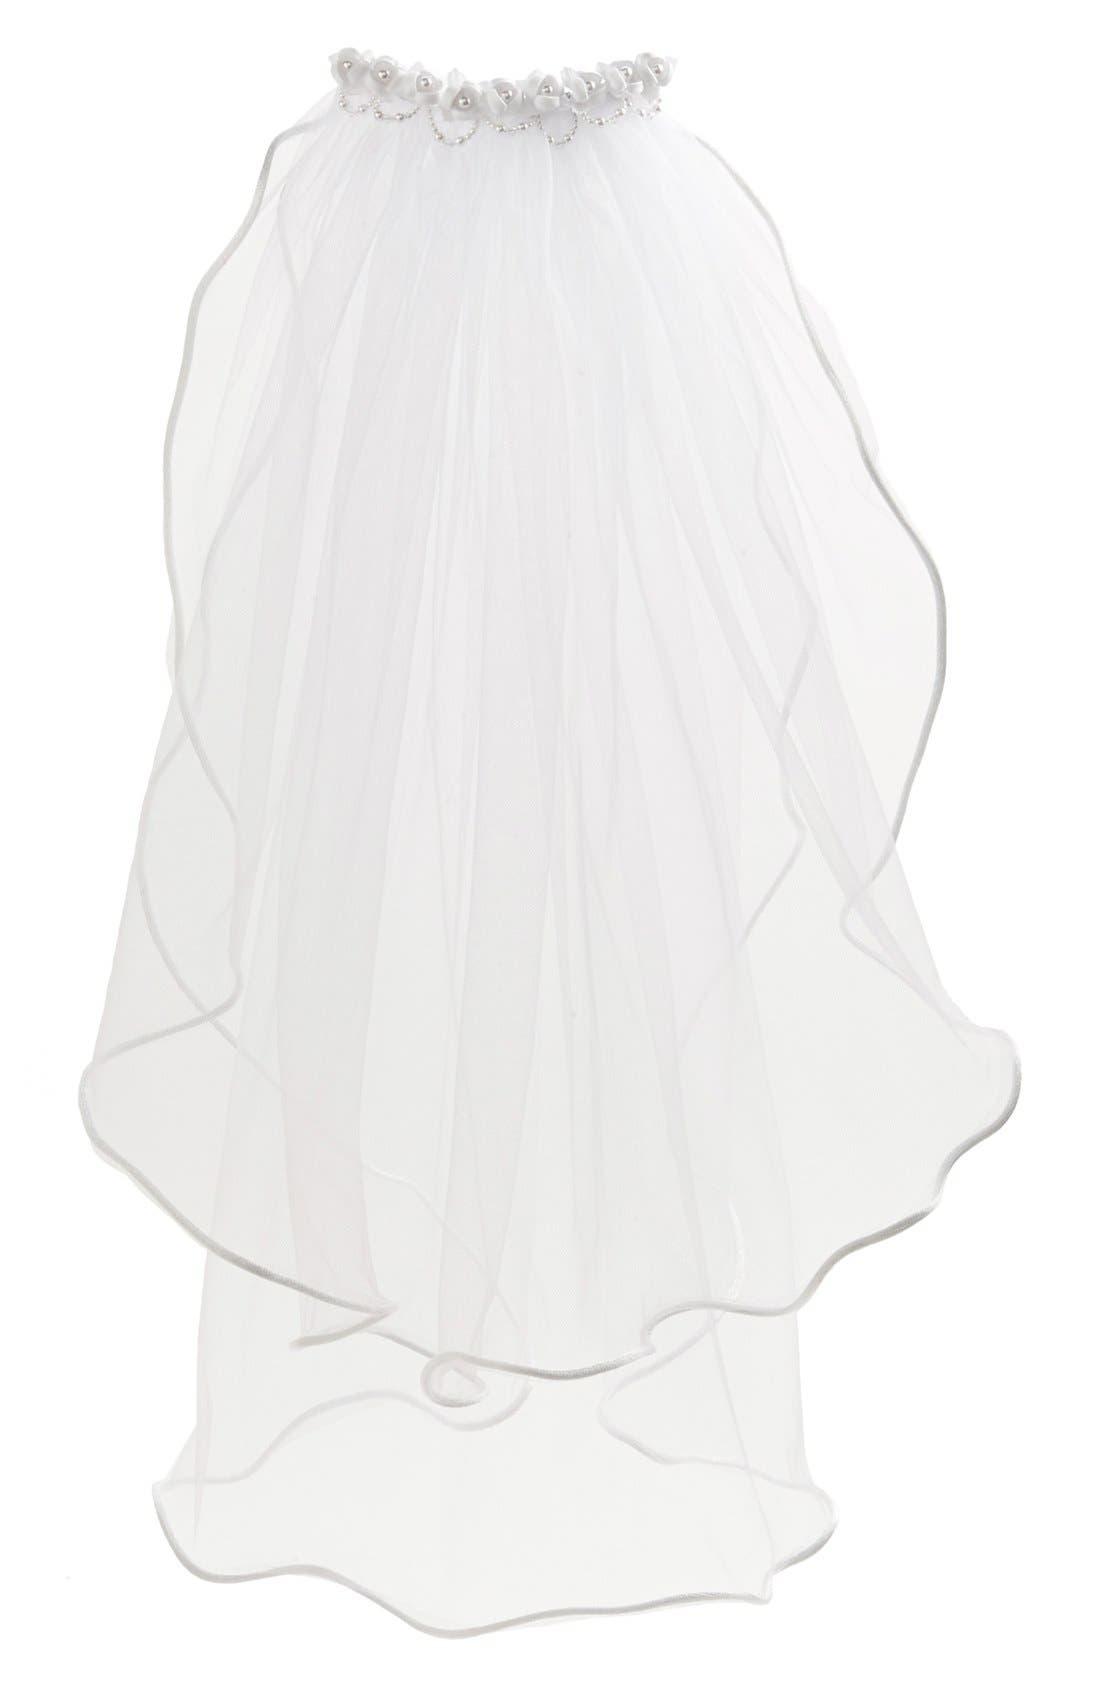 Alternate Image 1 Selected - Lauren Marie First Communion Veil